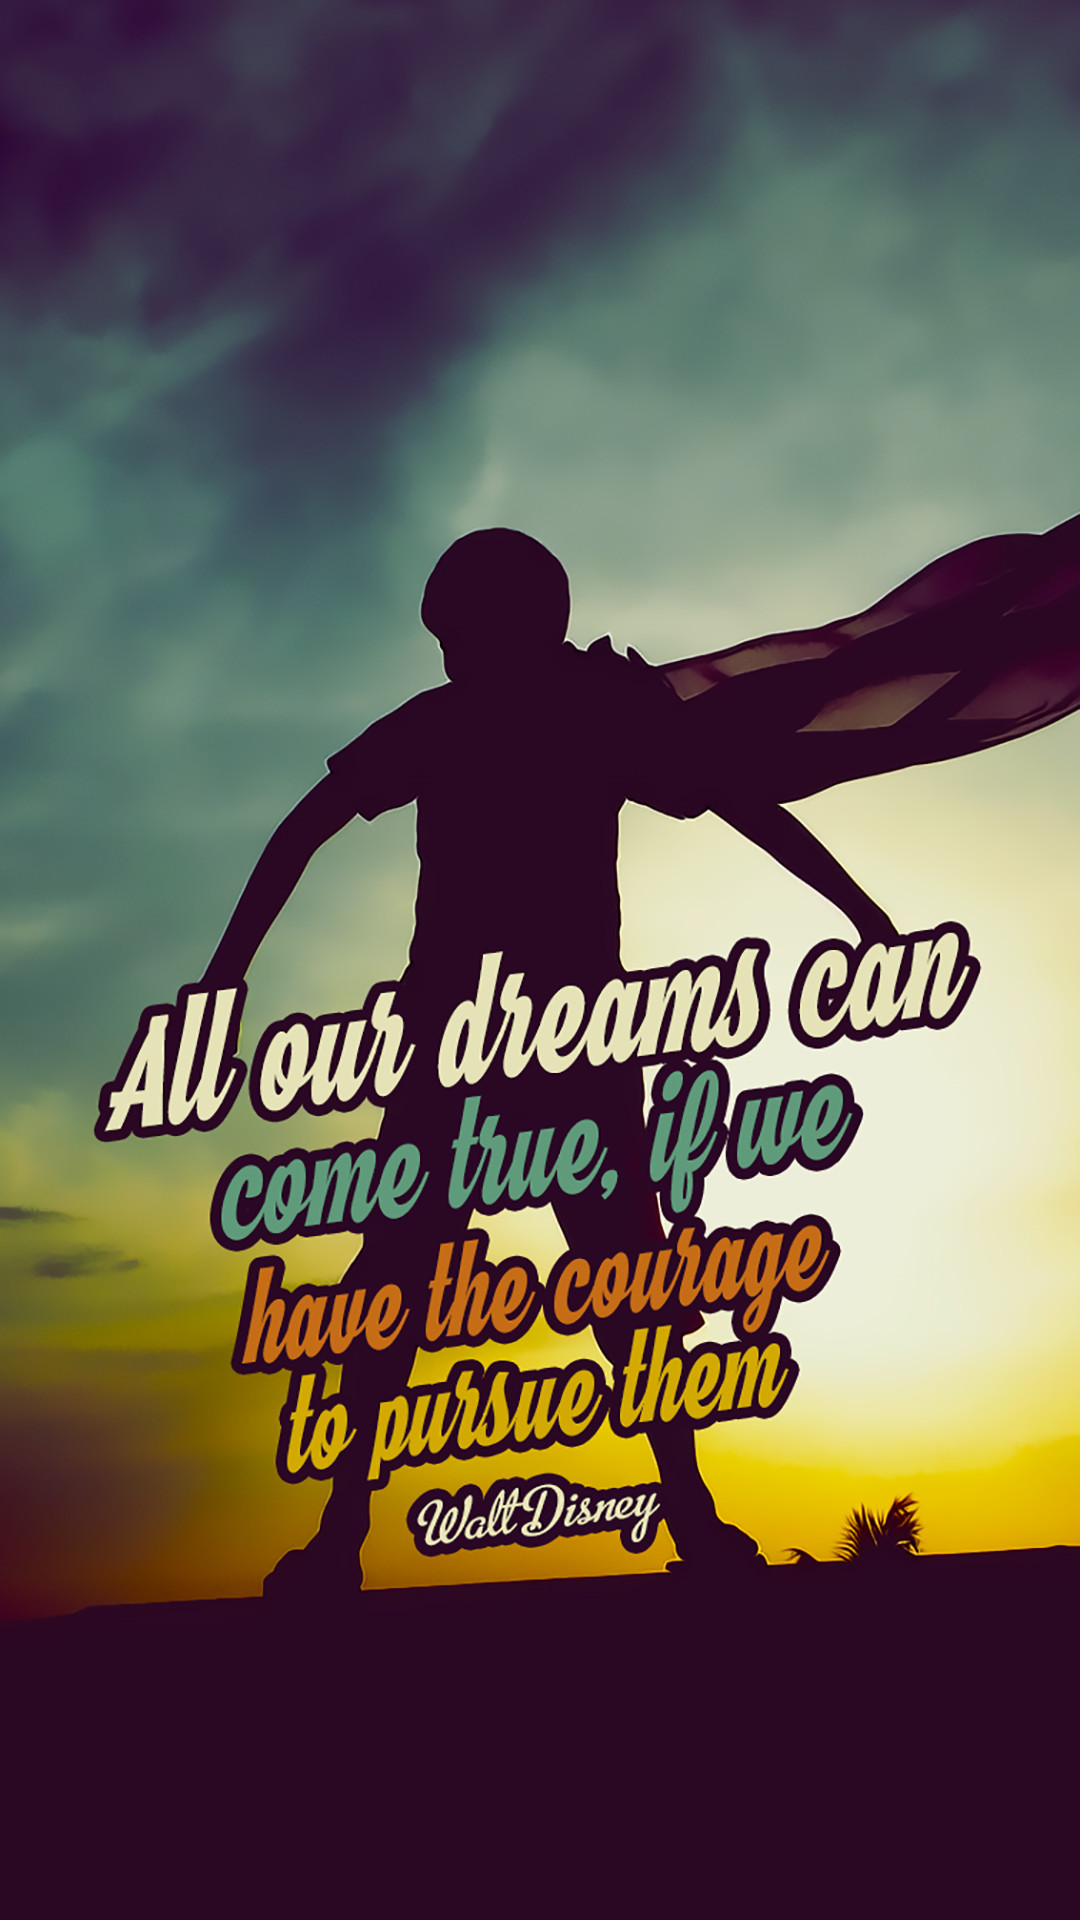 Art Creative Quotes Walt Disney Dreams Cartoons. Iphone 6 WallpaperWallpaper  …